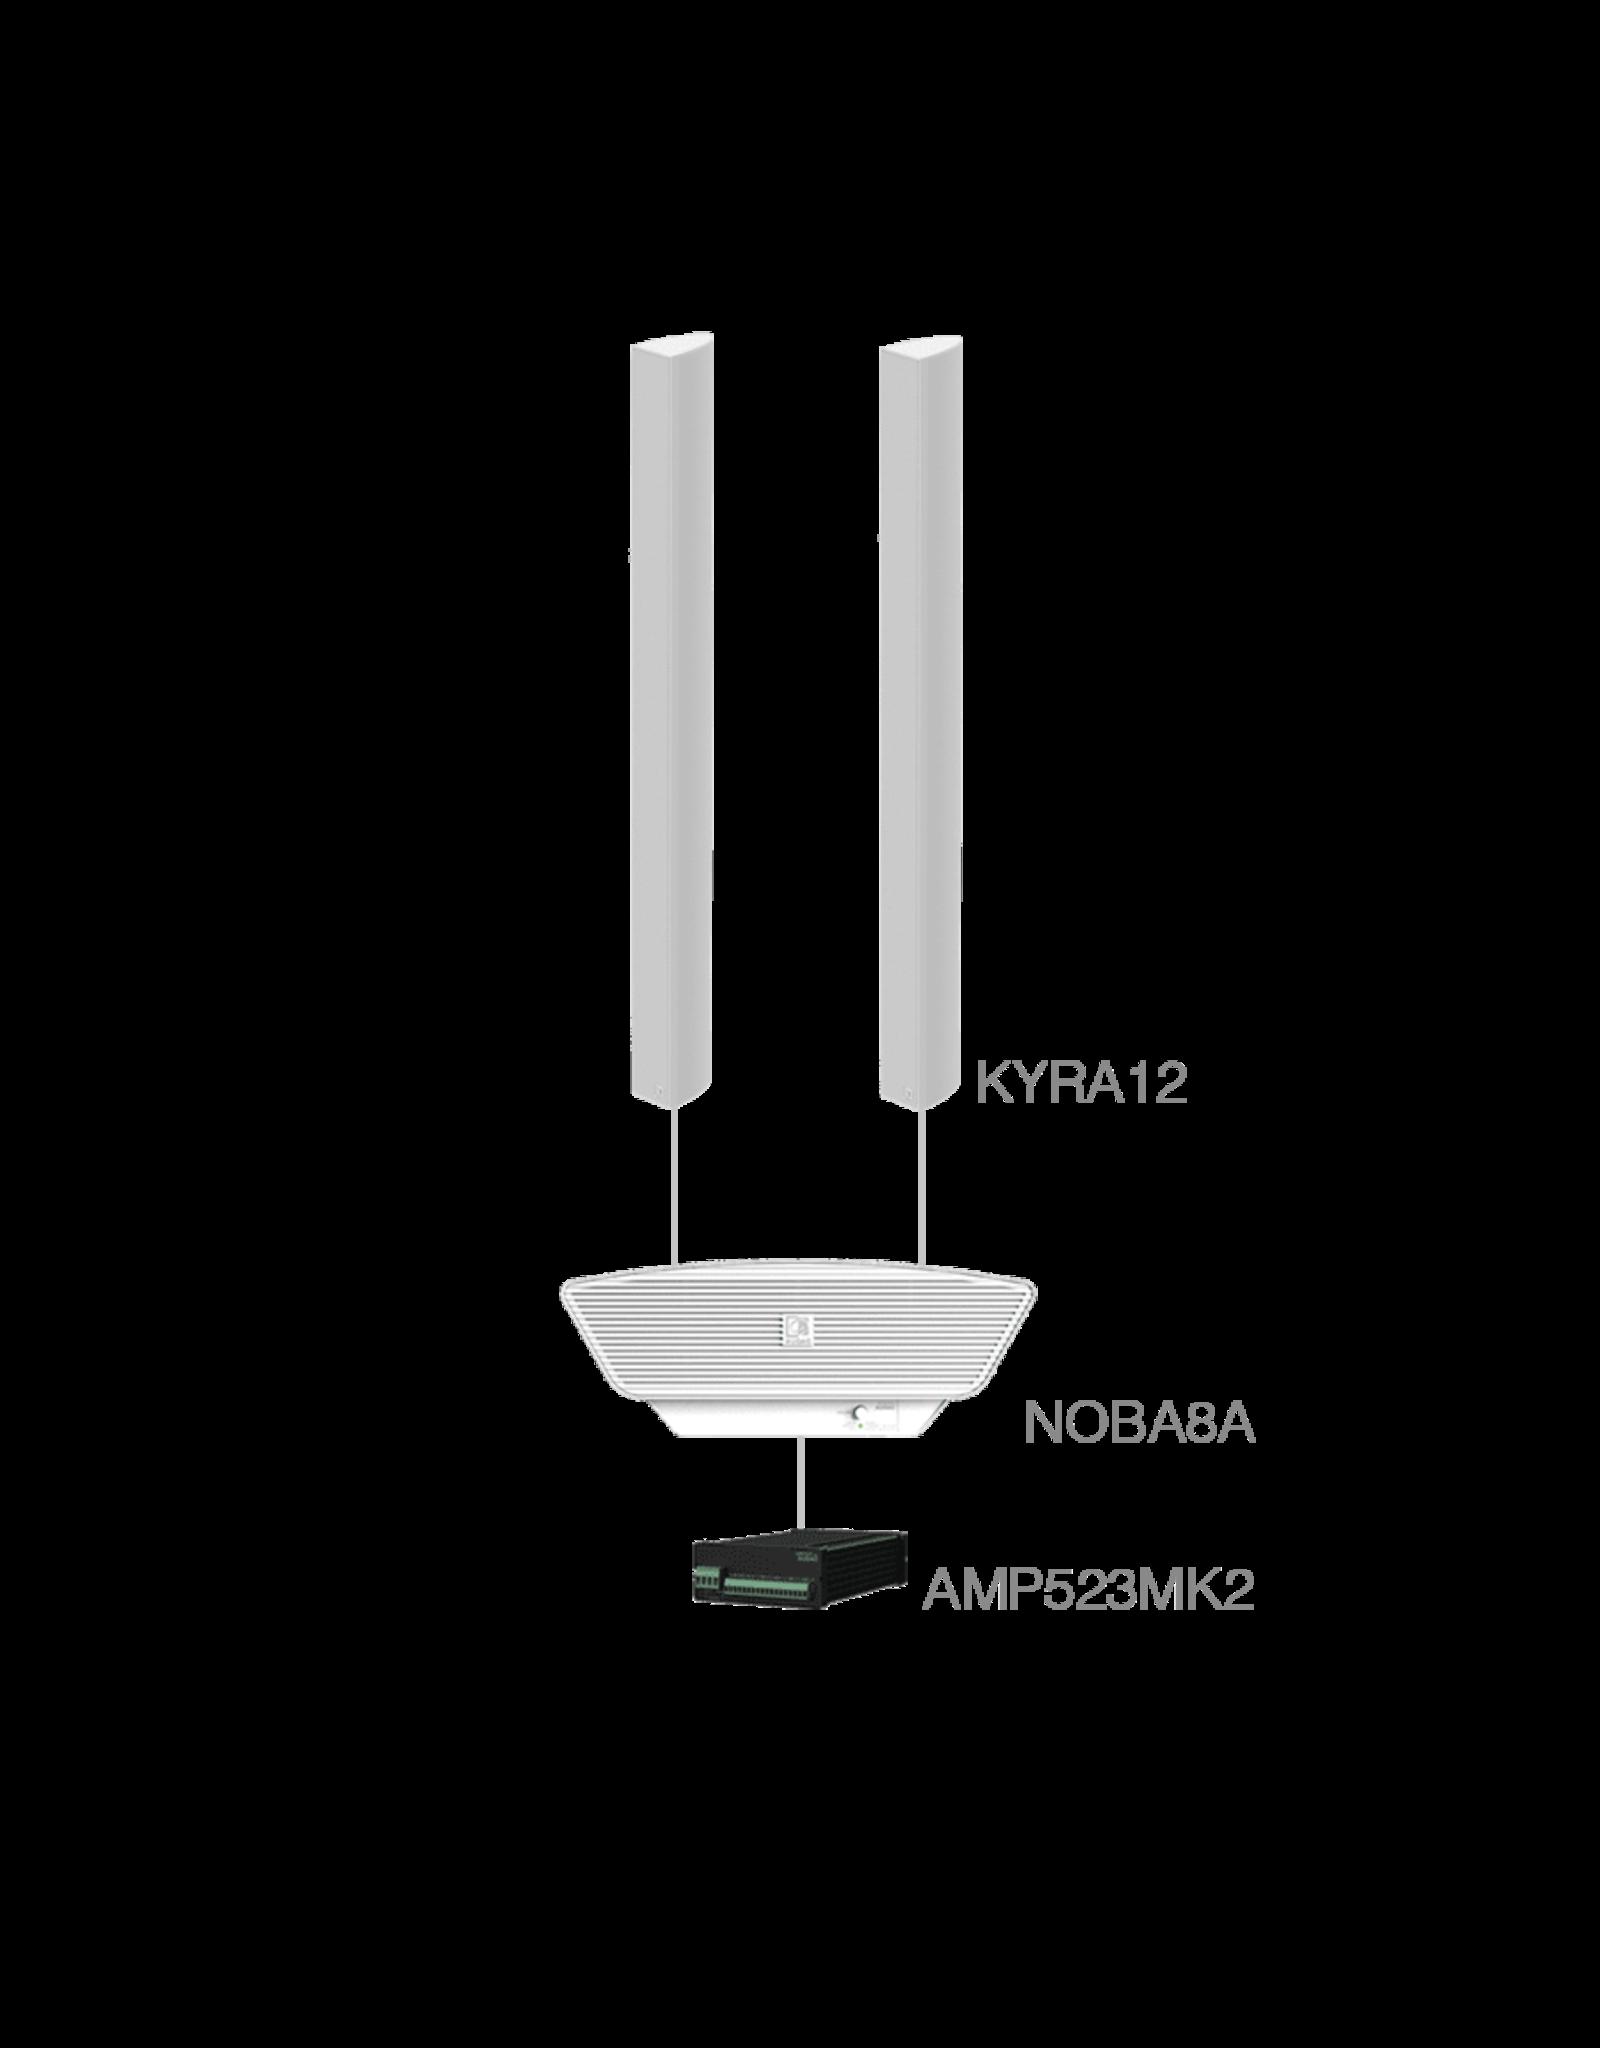 Audac 2 x KYRA12 + NOBA8A + AMP523MK2 White